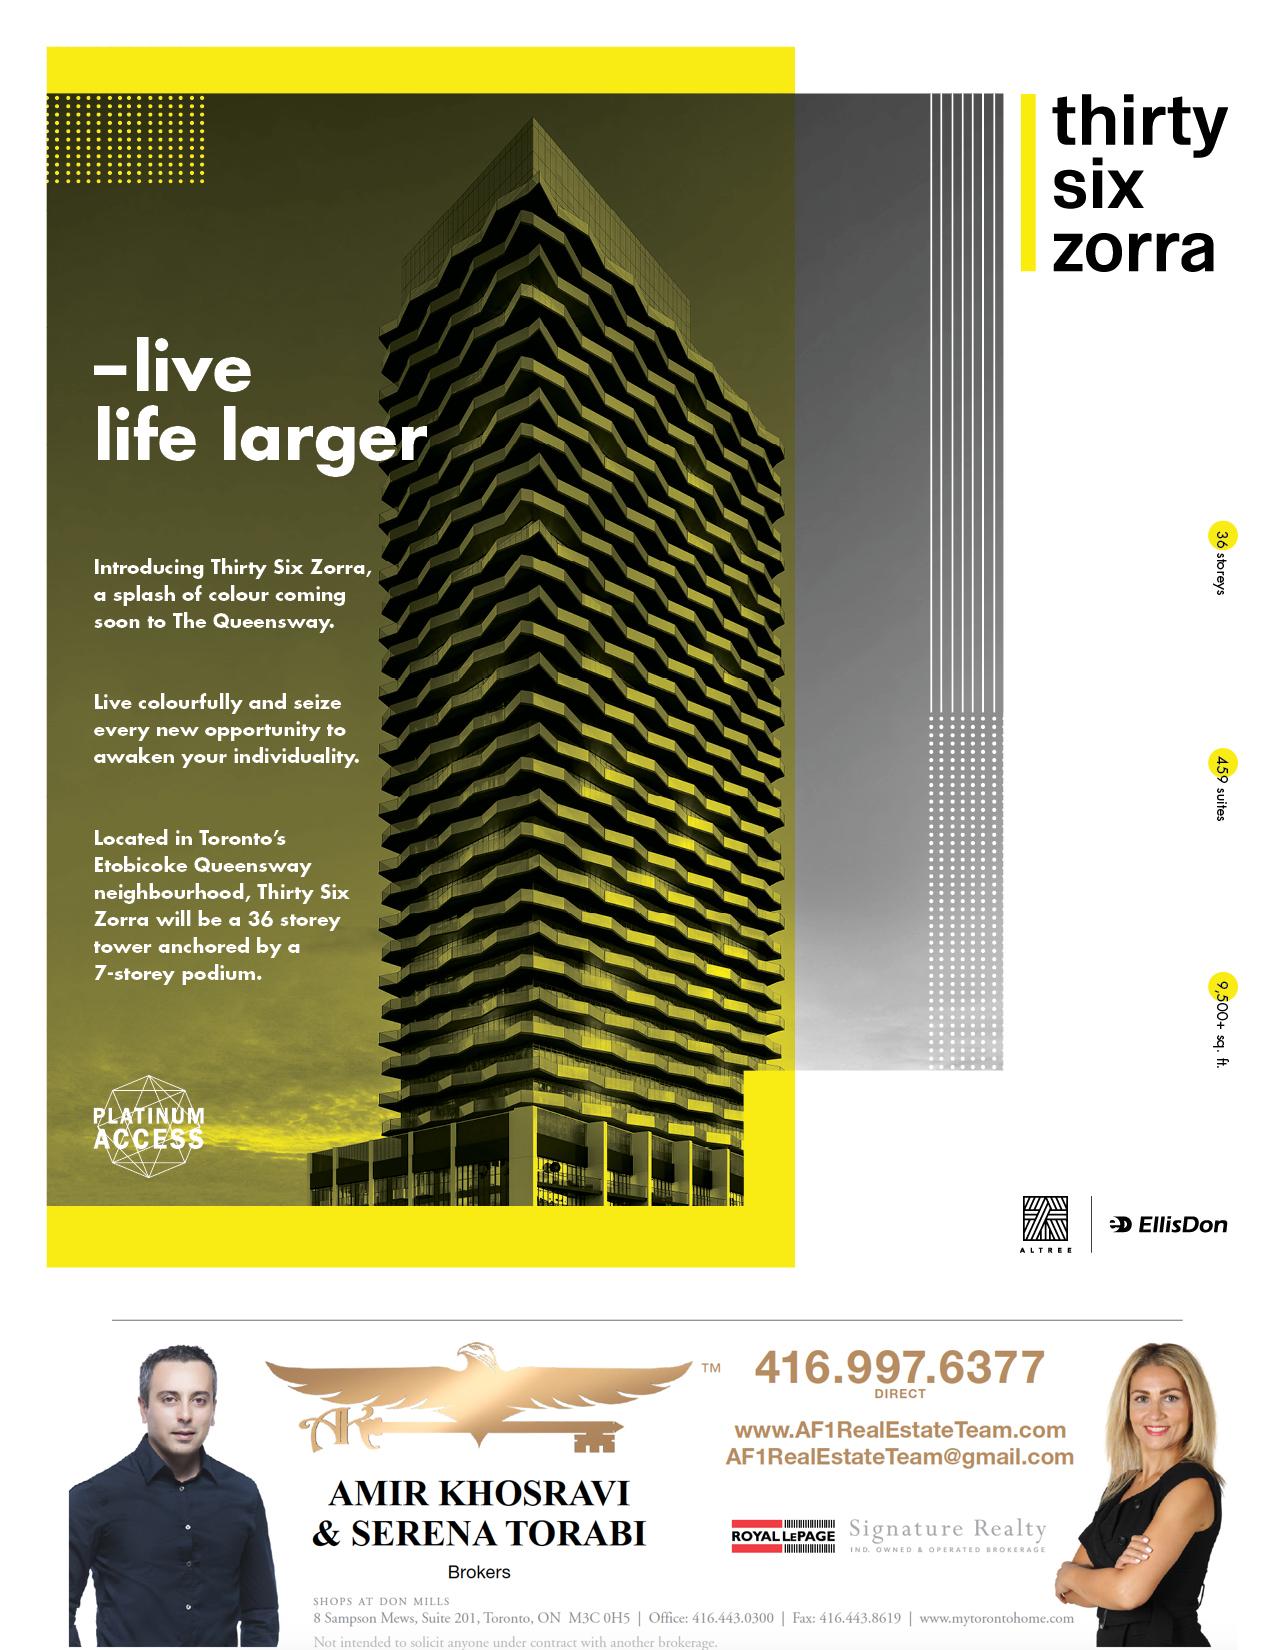 Thirty Six Zorra